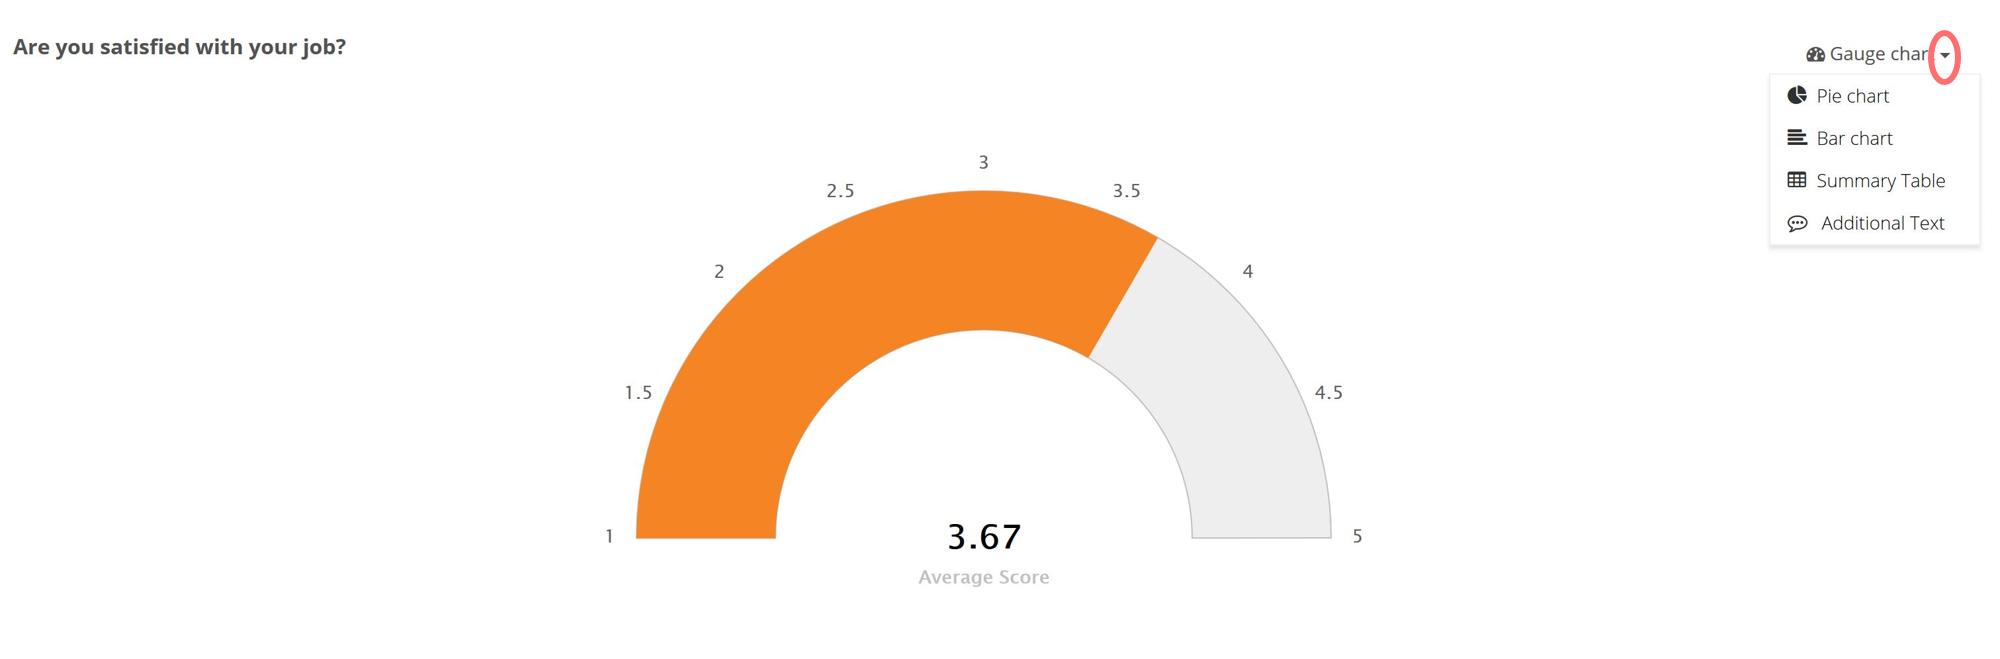 charts view gauge chart